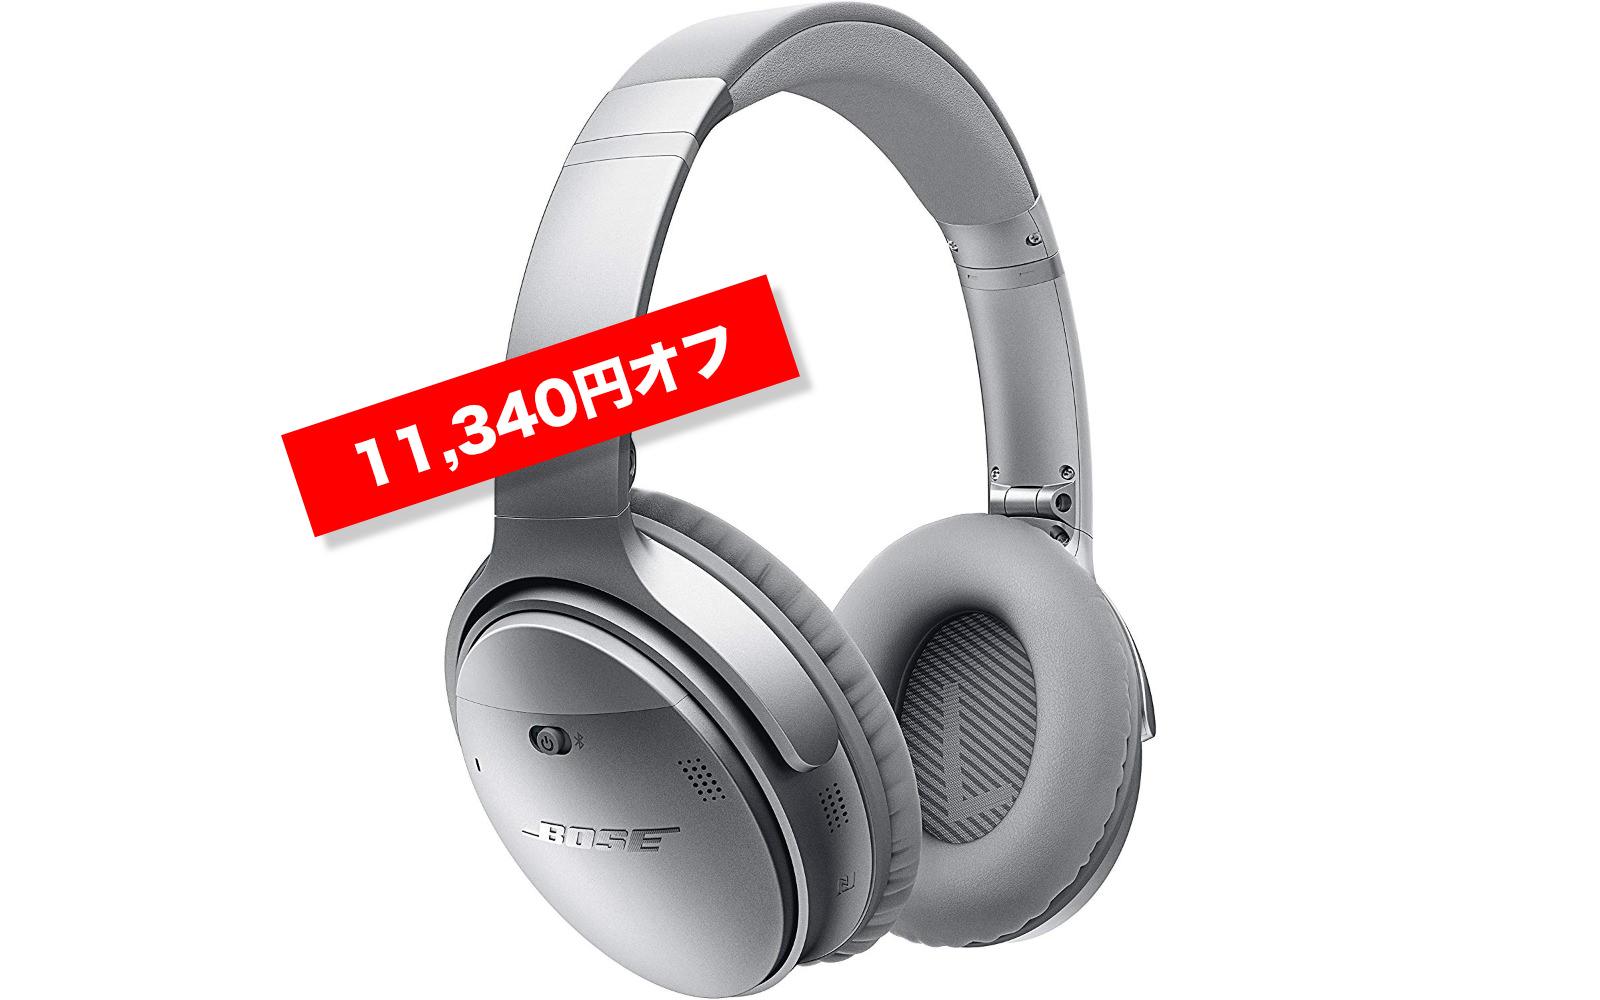 Bose QC35 sale